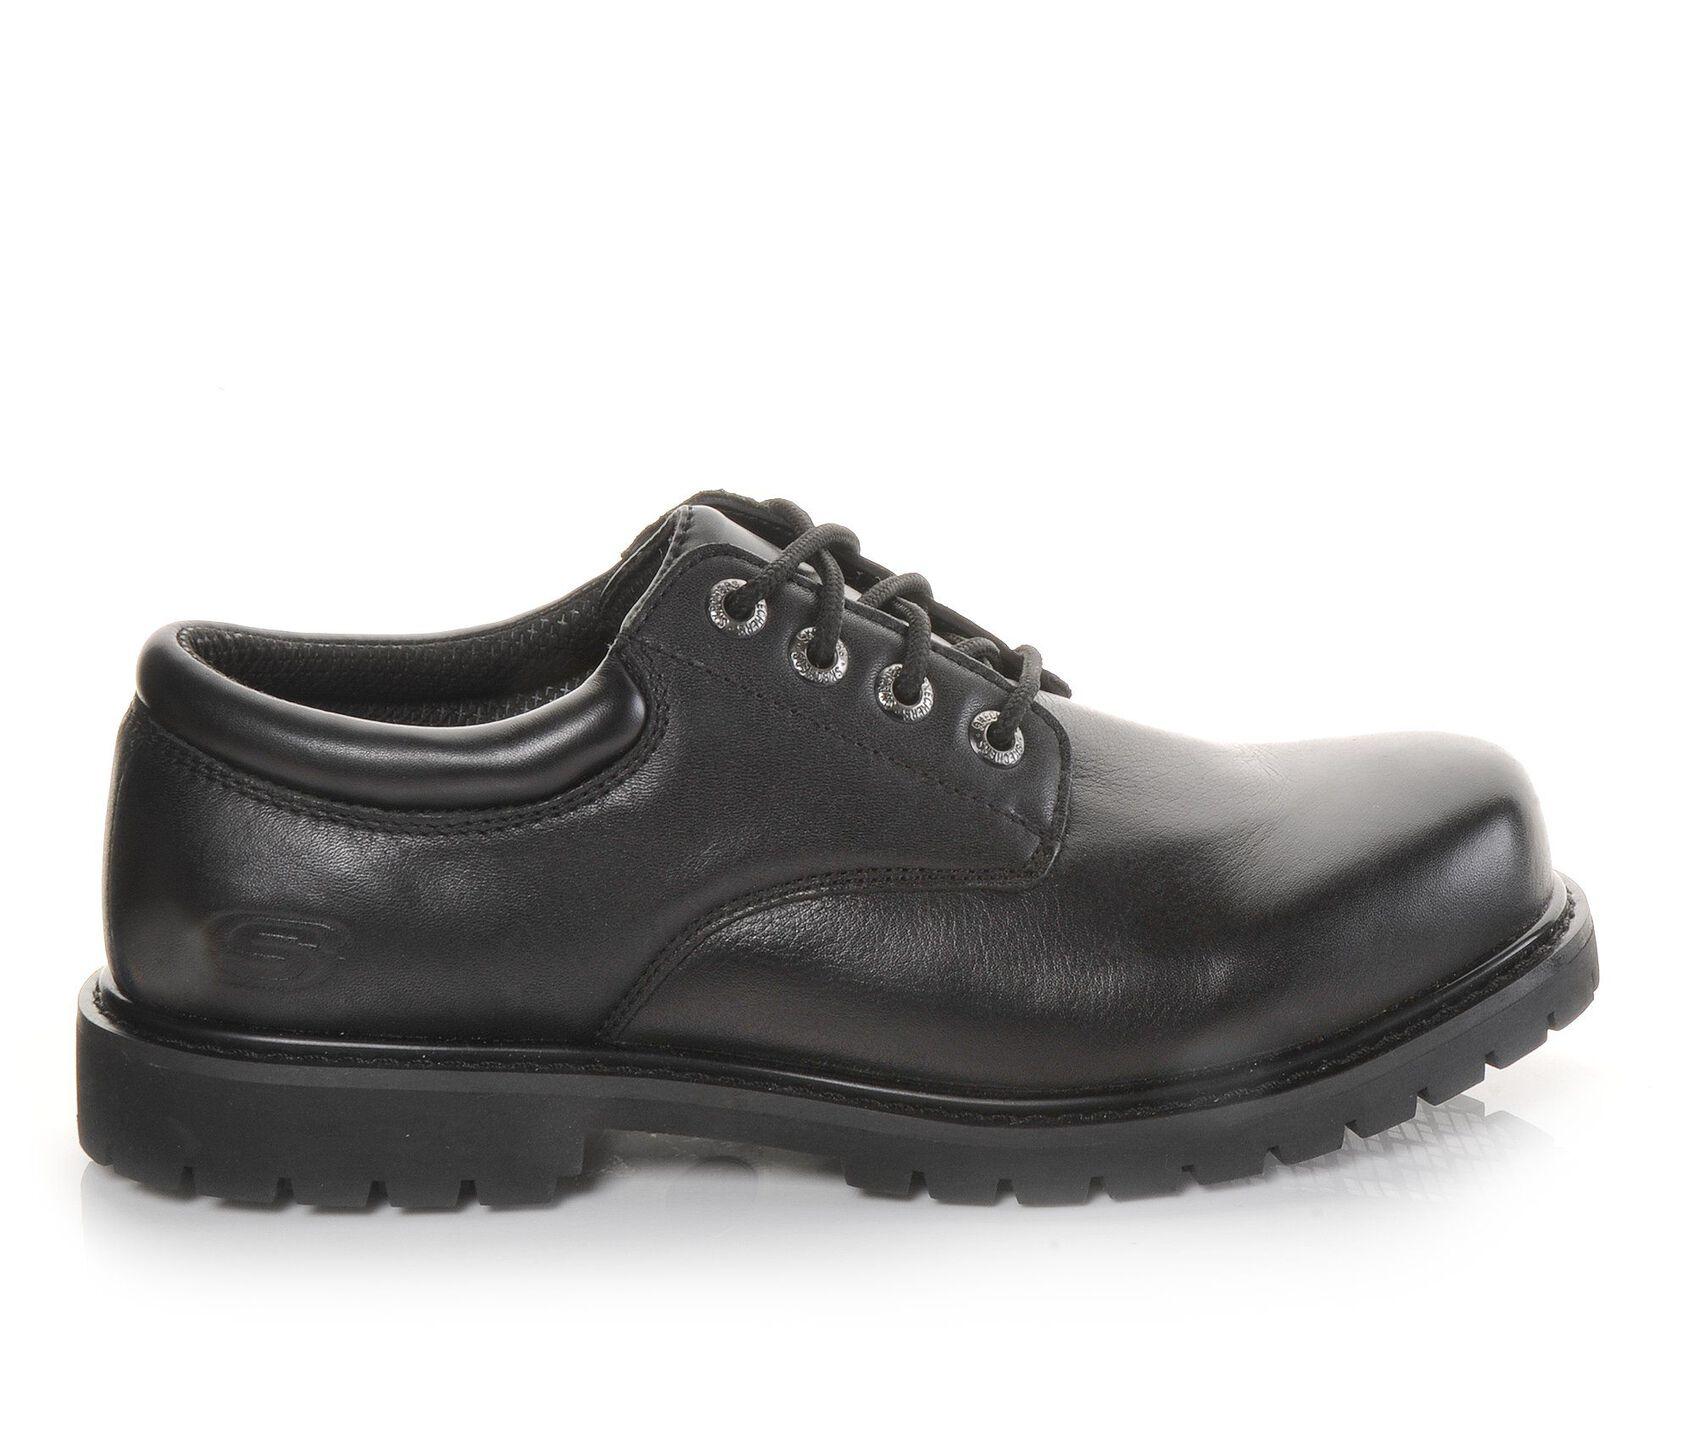 69cfa23b858a Men s Skechers Work Elks Slip Resistant 77041 Safety Shoes